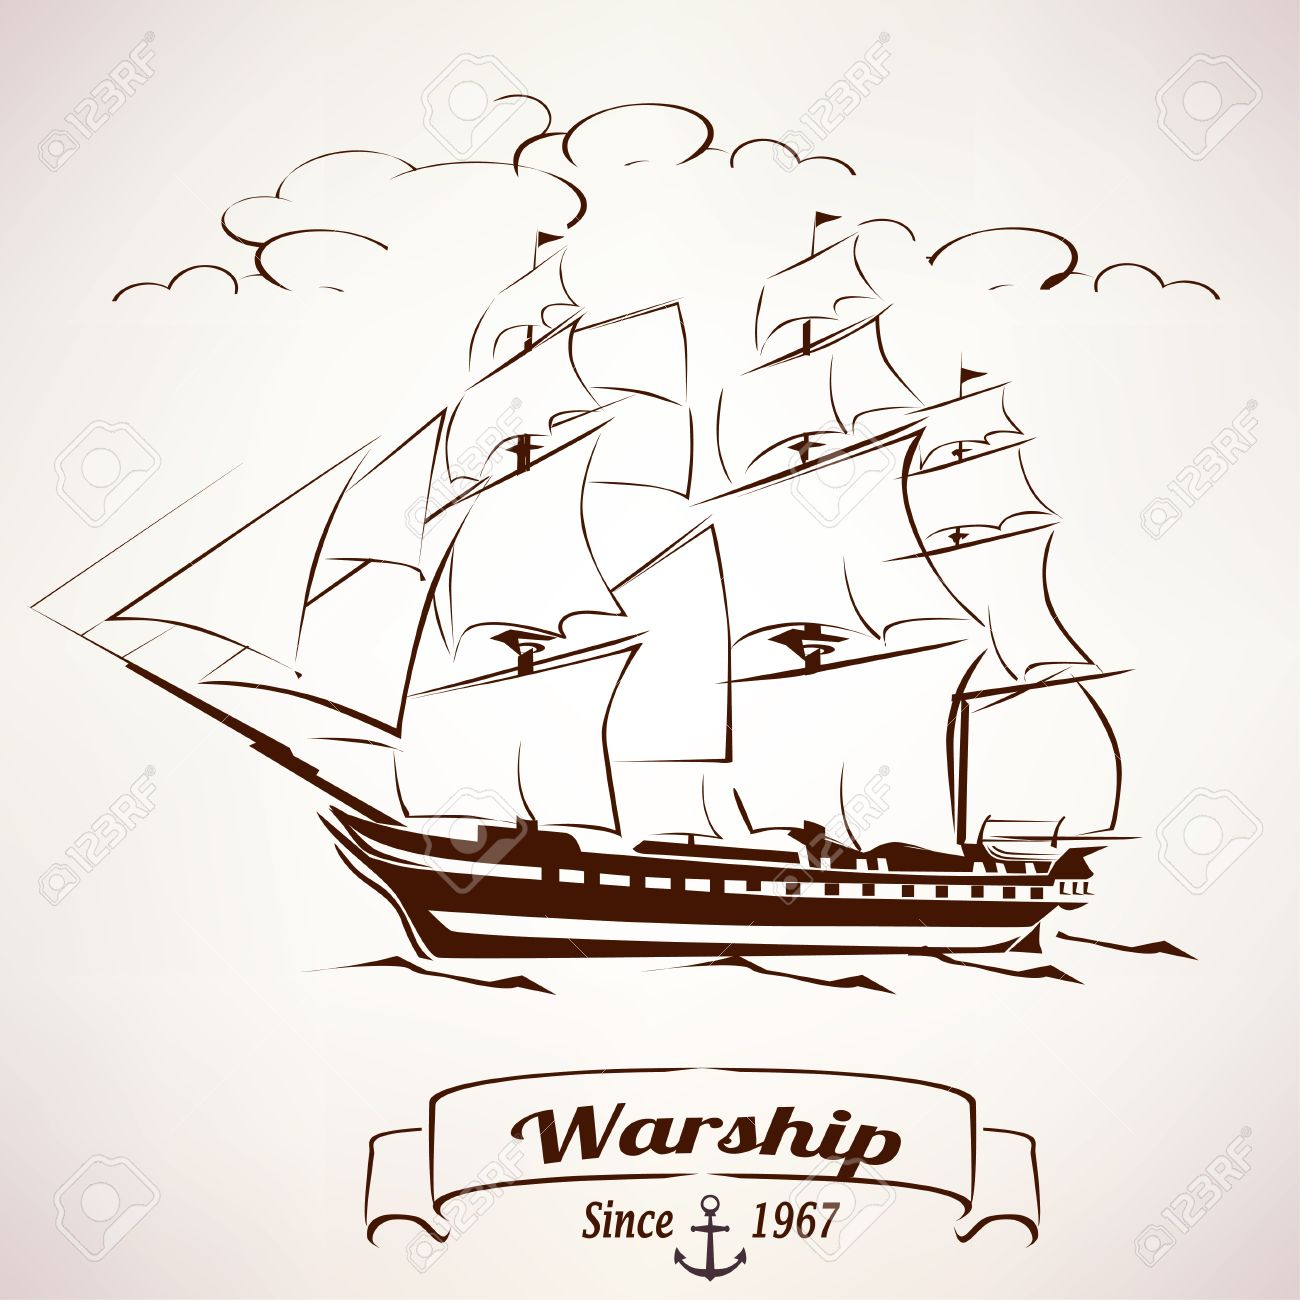 1300x1300 Sailer, Vintage Wooden Ship Vector Sketch Royalty Free Cliparts